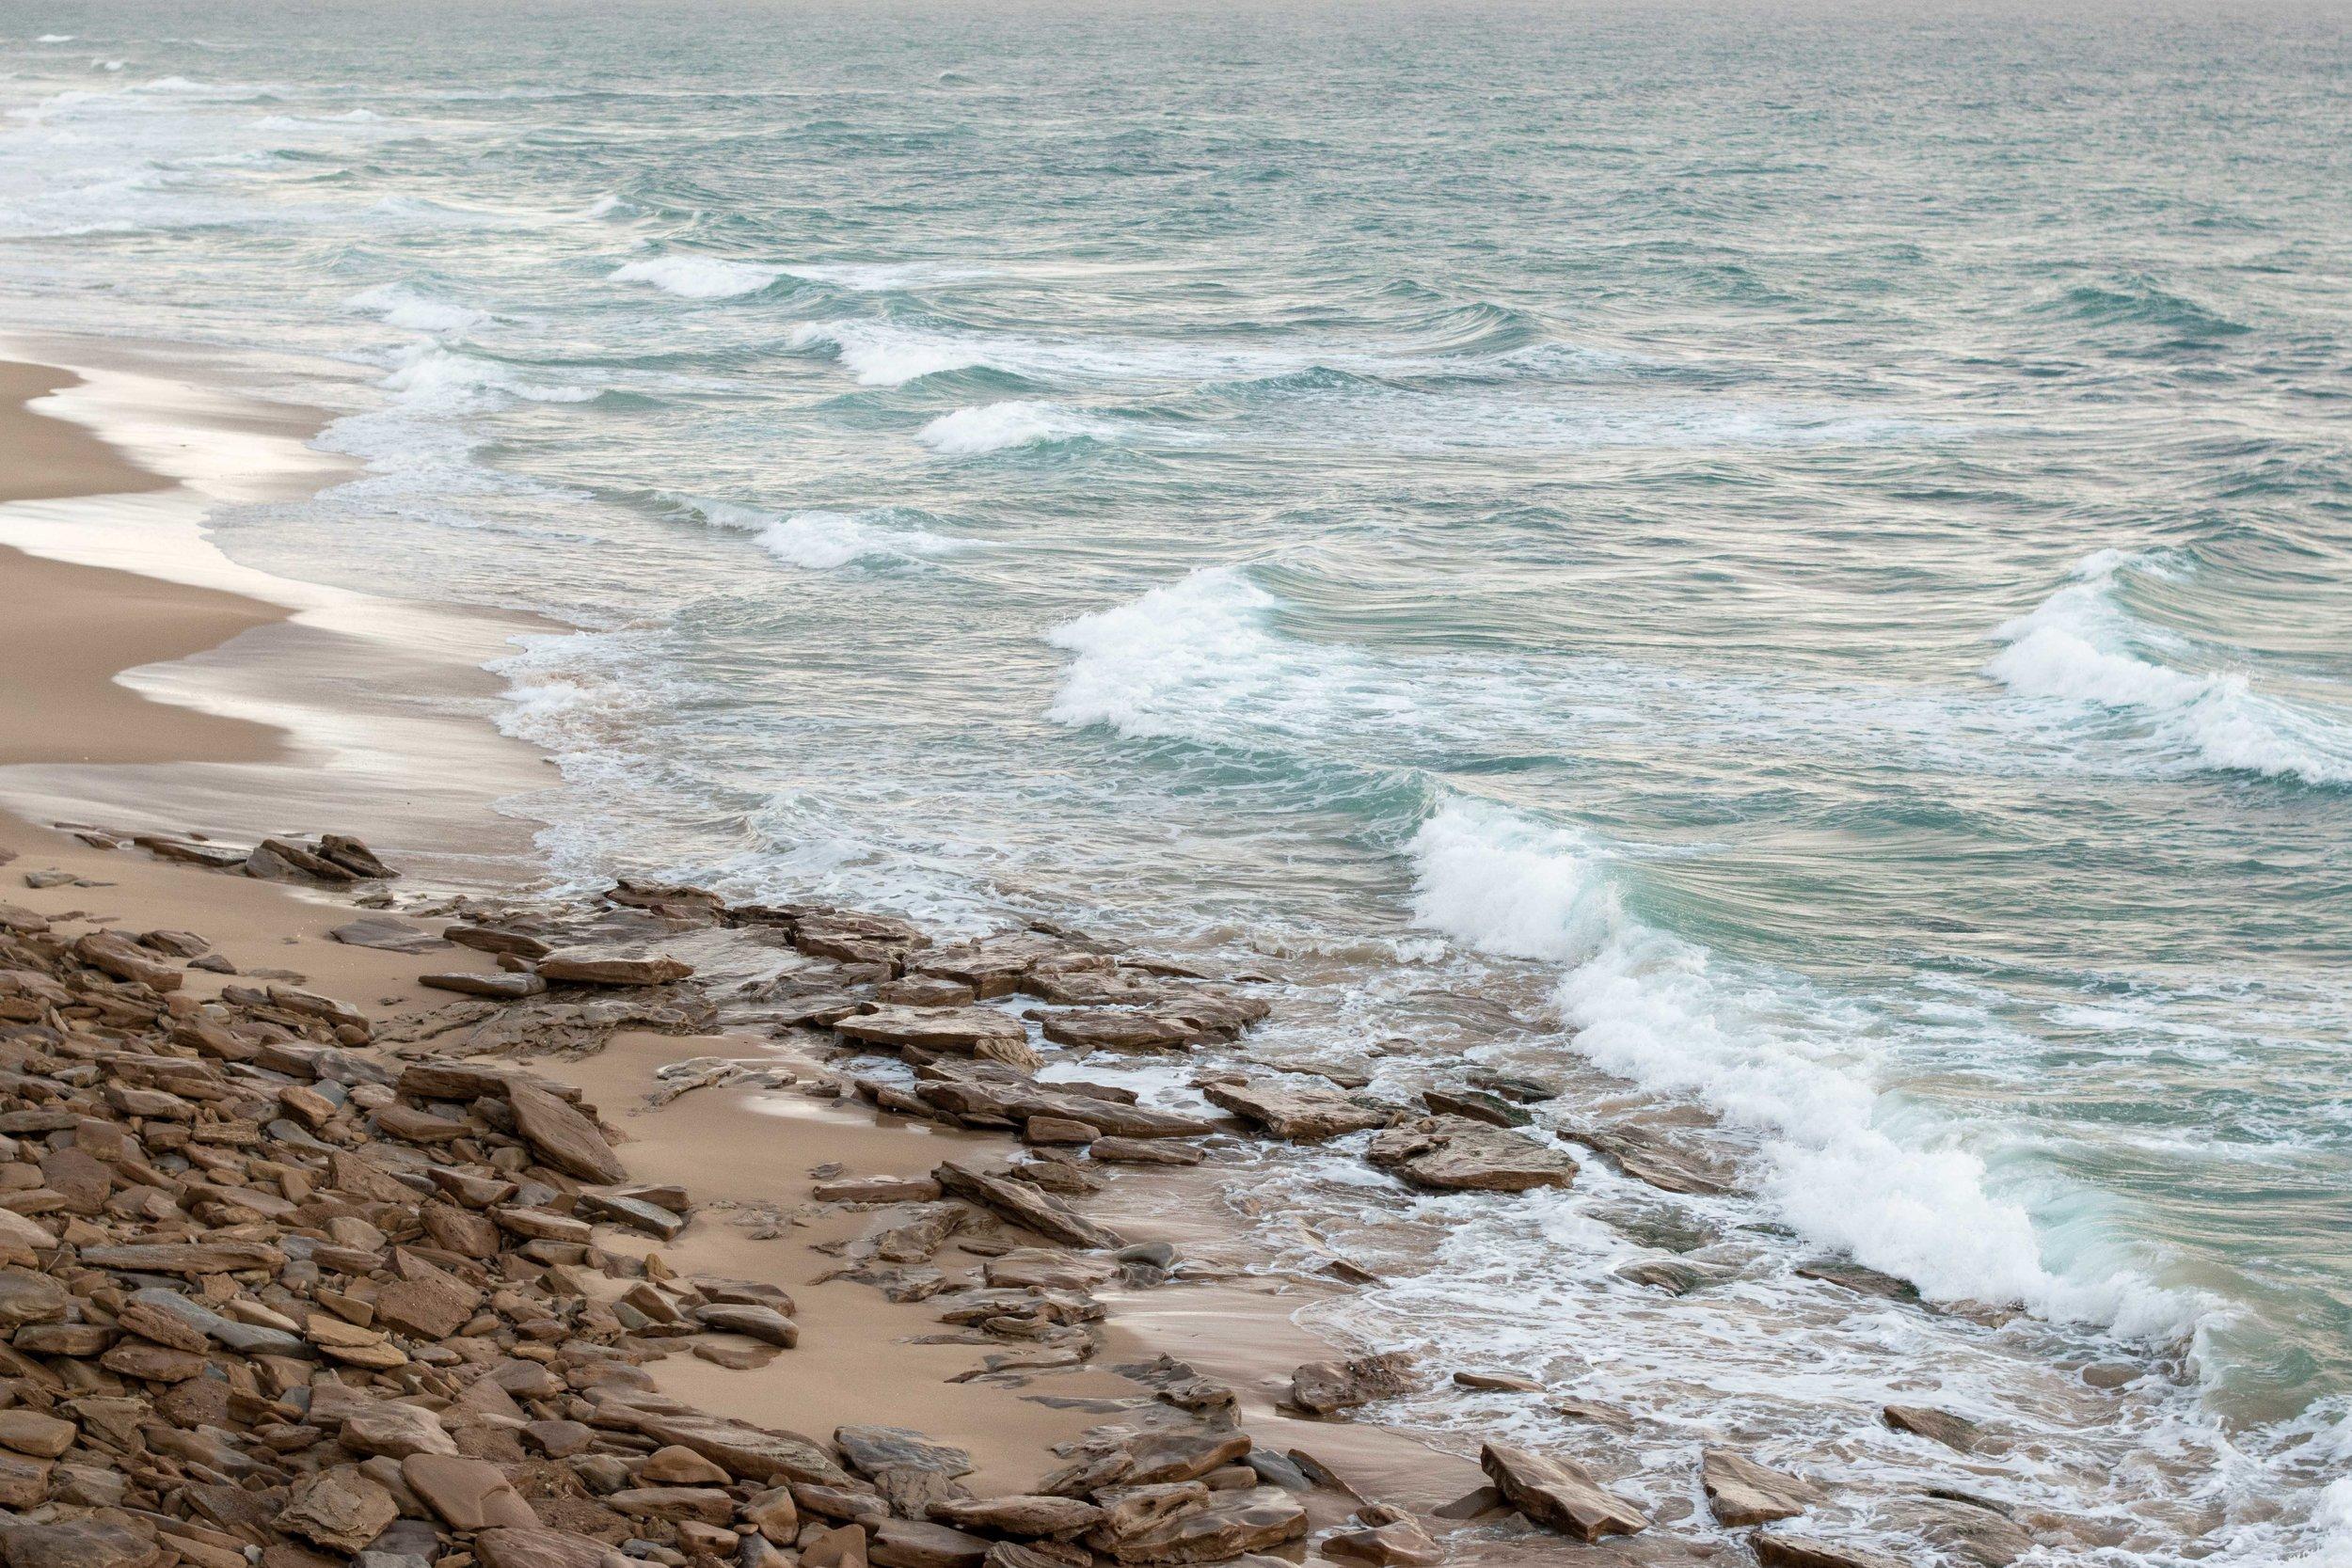 LAKE TYERS BEACH - GIPPSLAND, VICTORIA